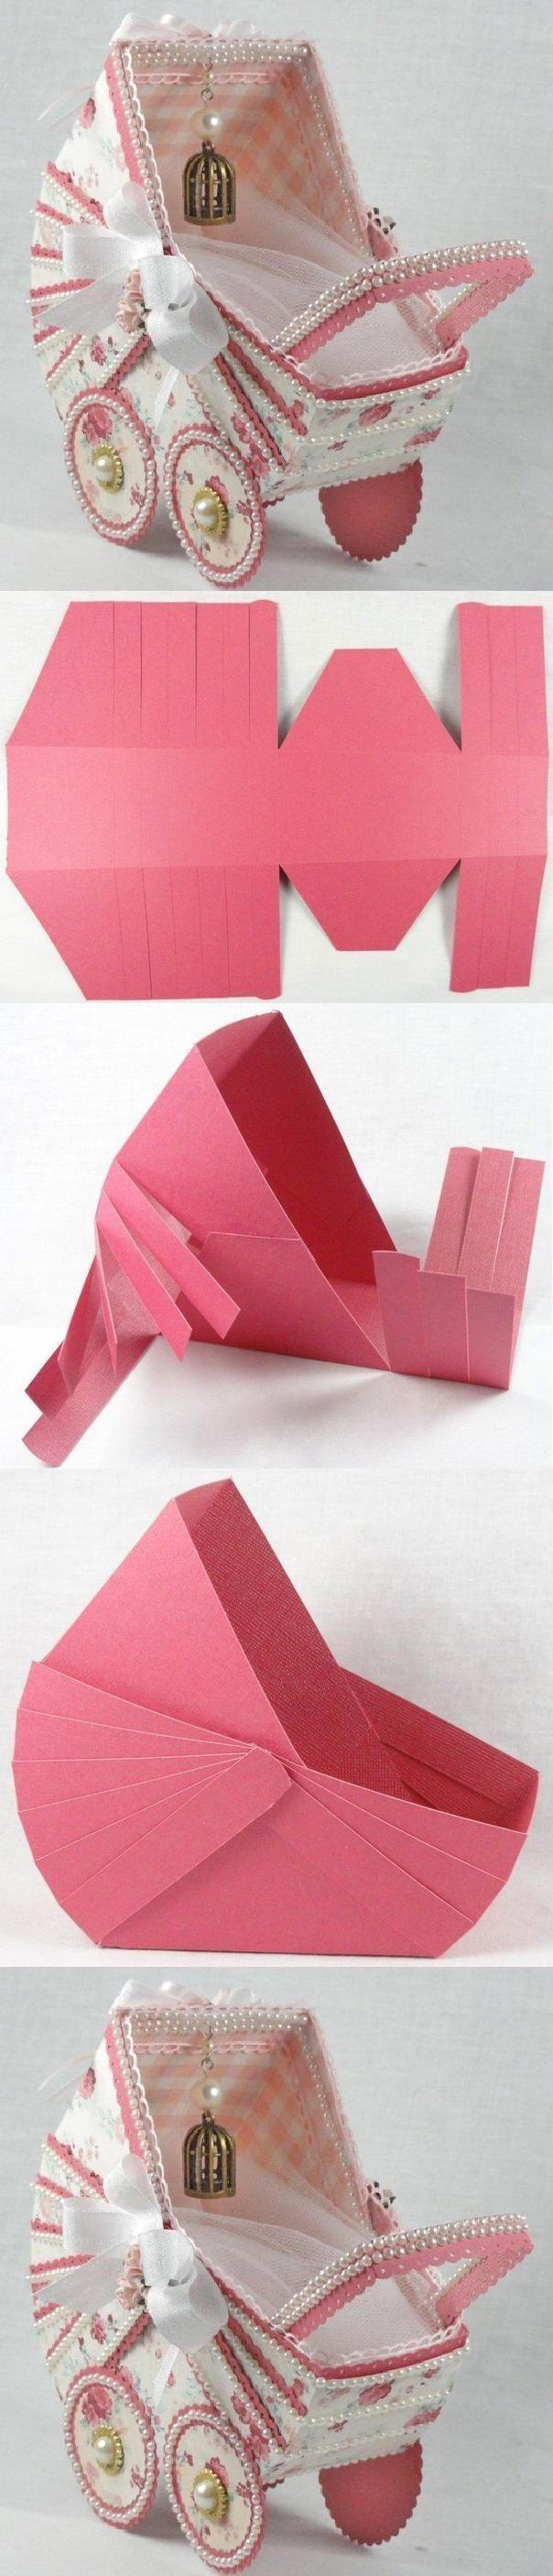 DIY Paper Stroller DIY Projects